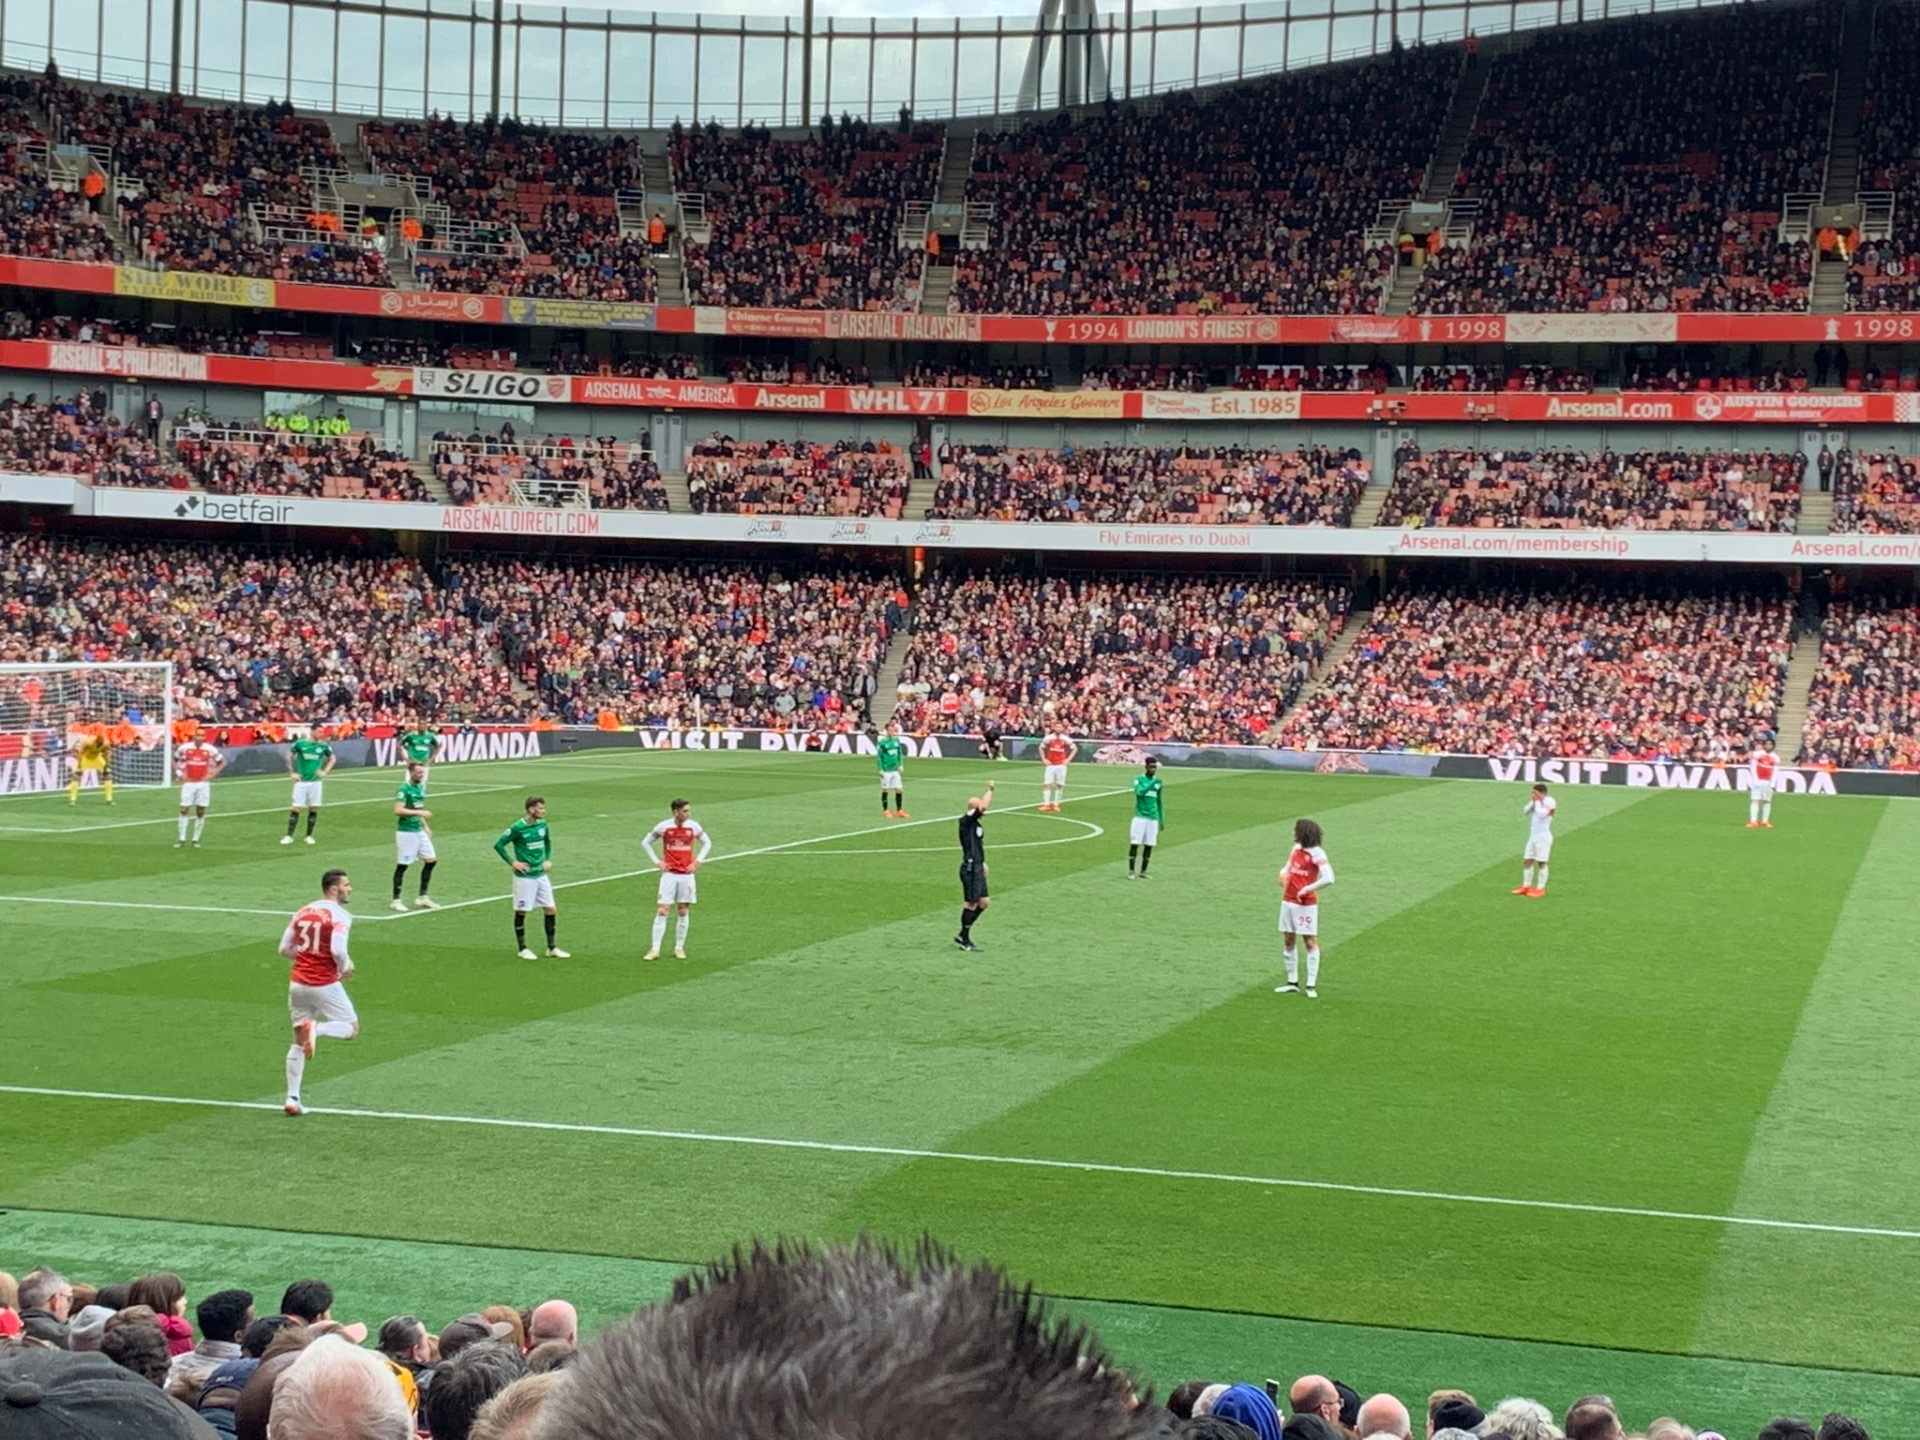 Emirates Stadium Section 2 Row 18 Seat 36